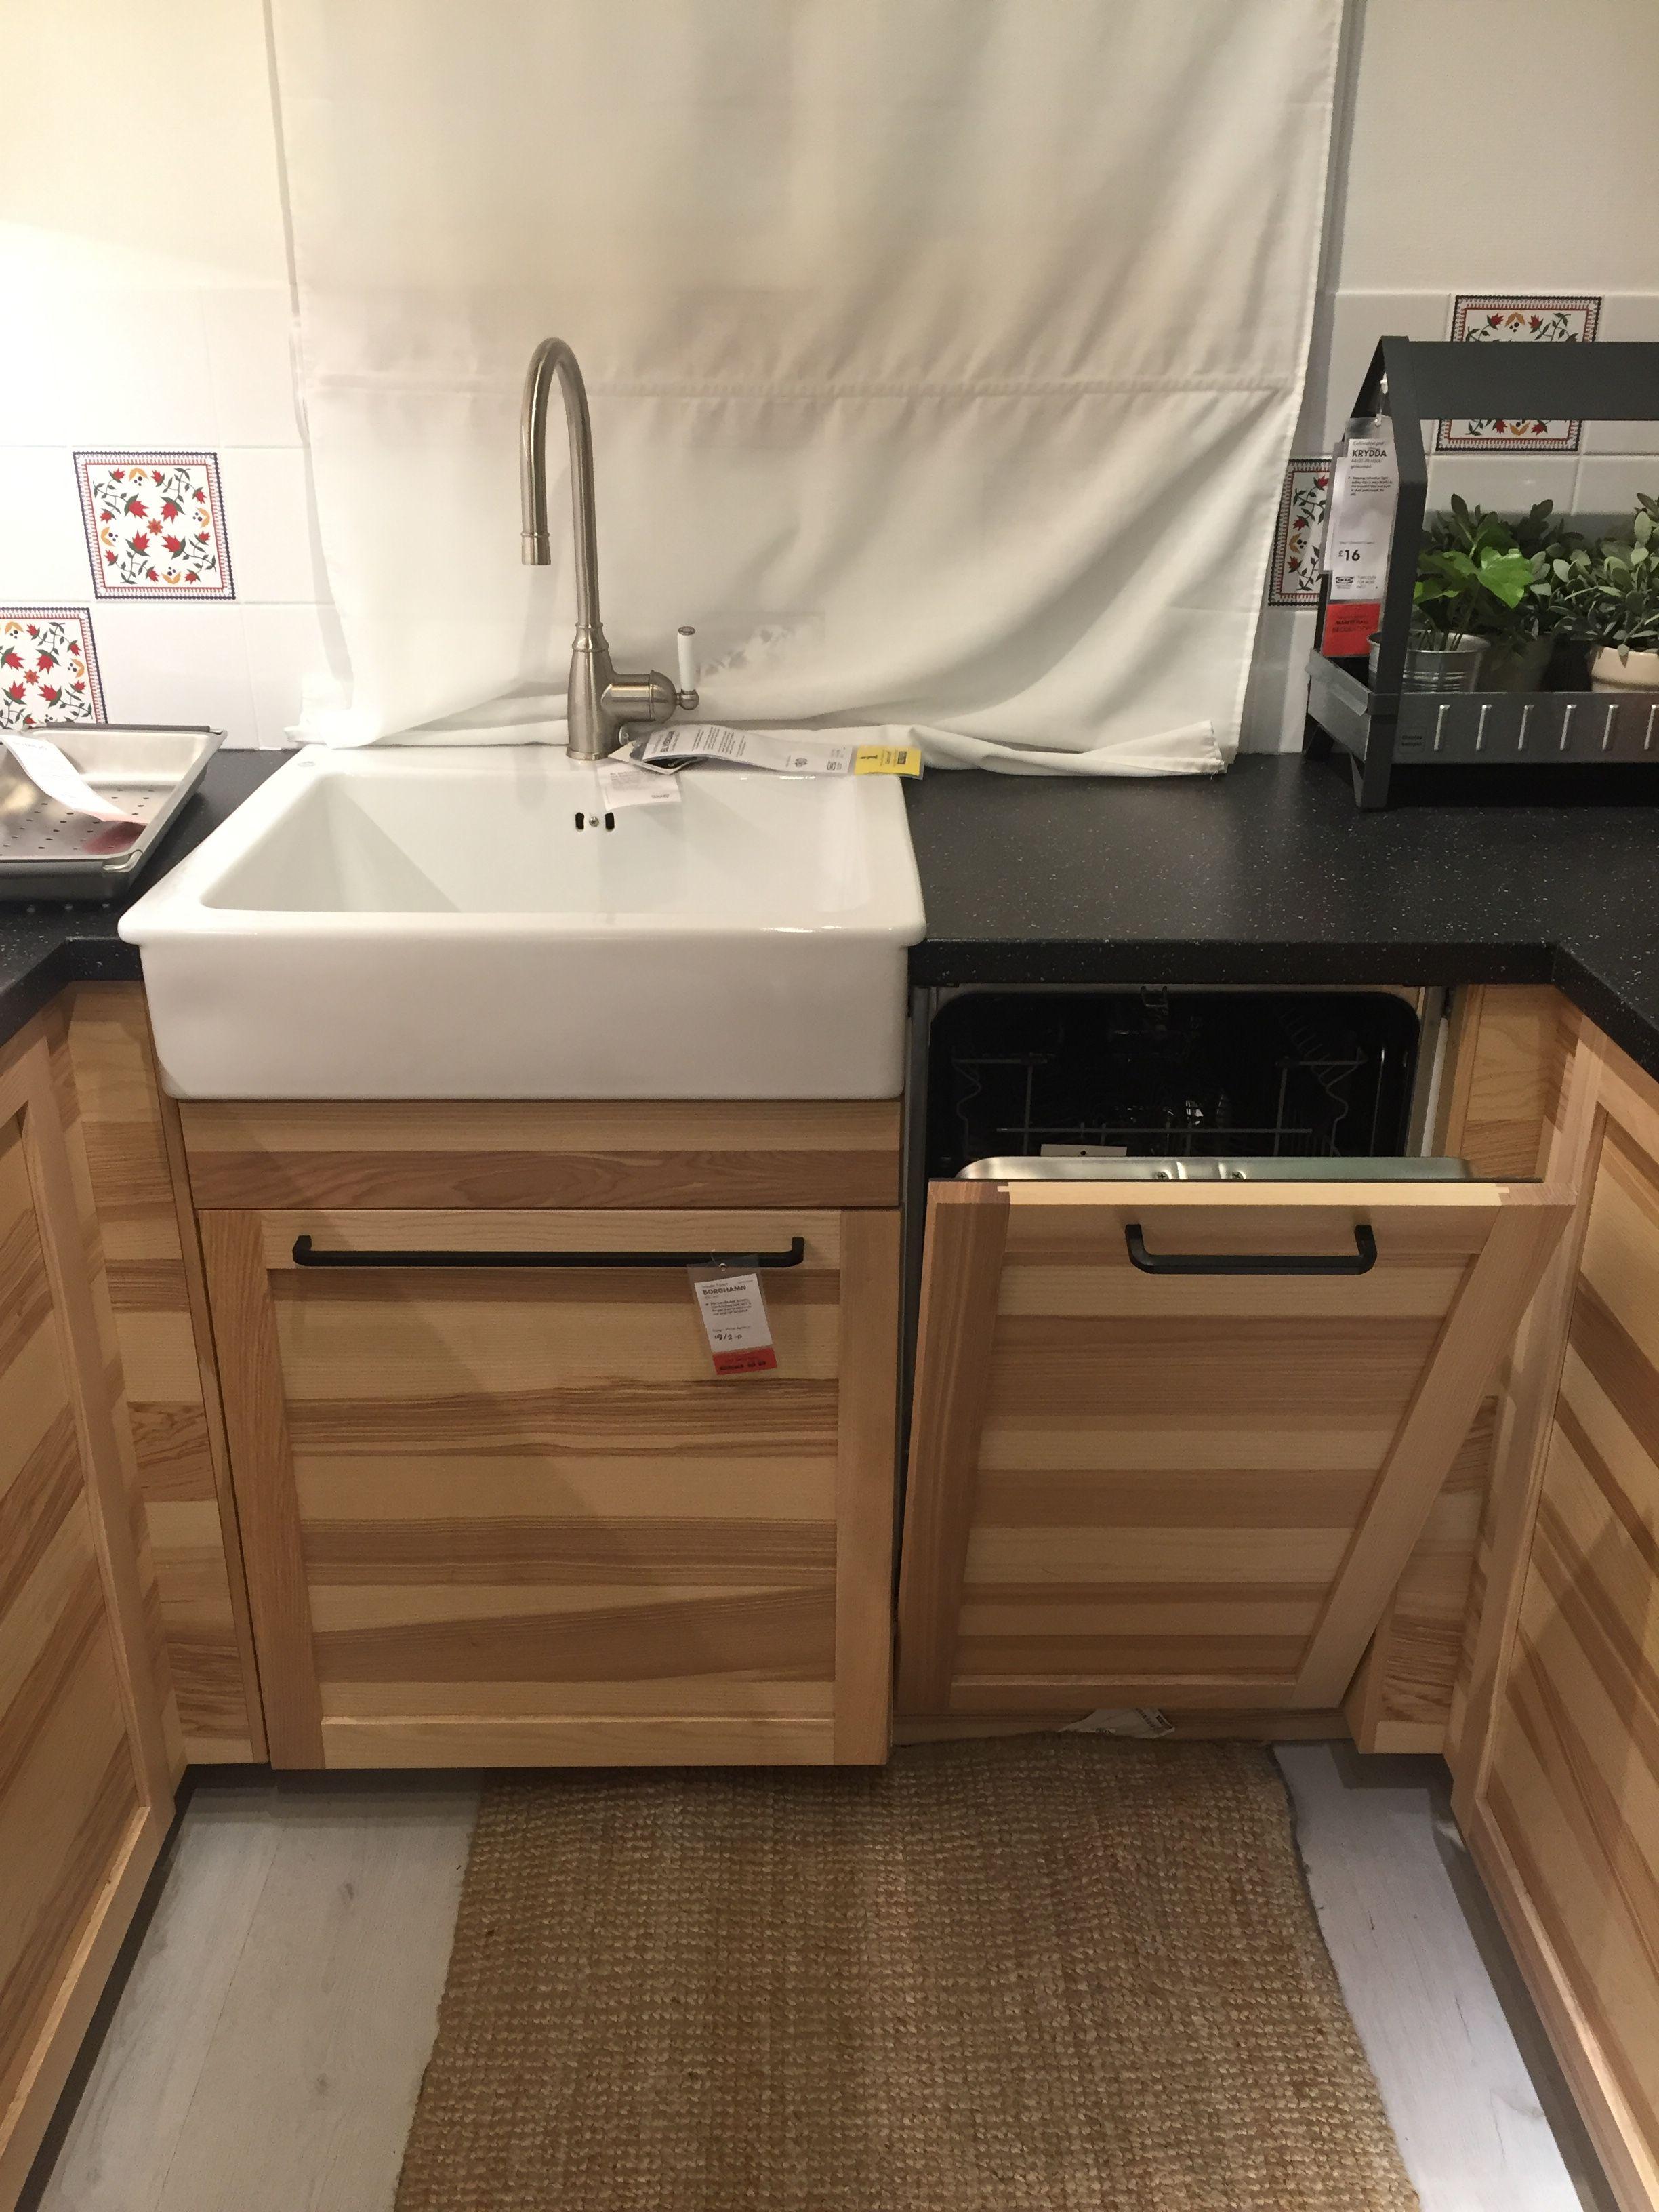 DOMSJÖ Onset Sink, 1 Bowl White 62x66 Cm   IKEA